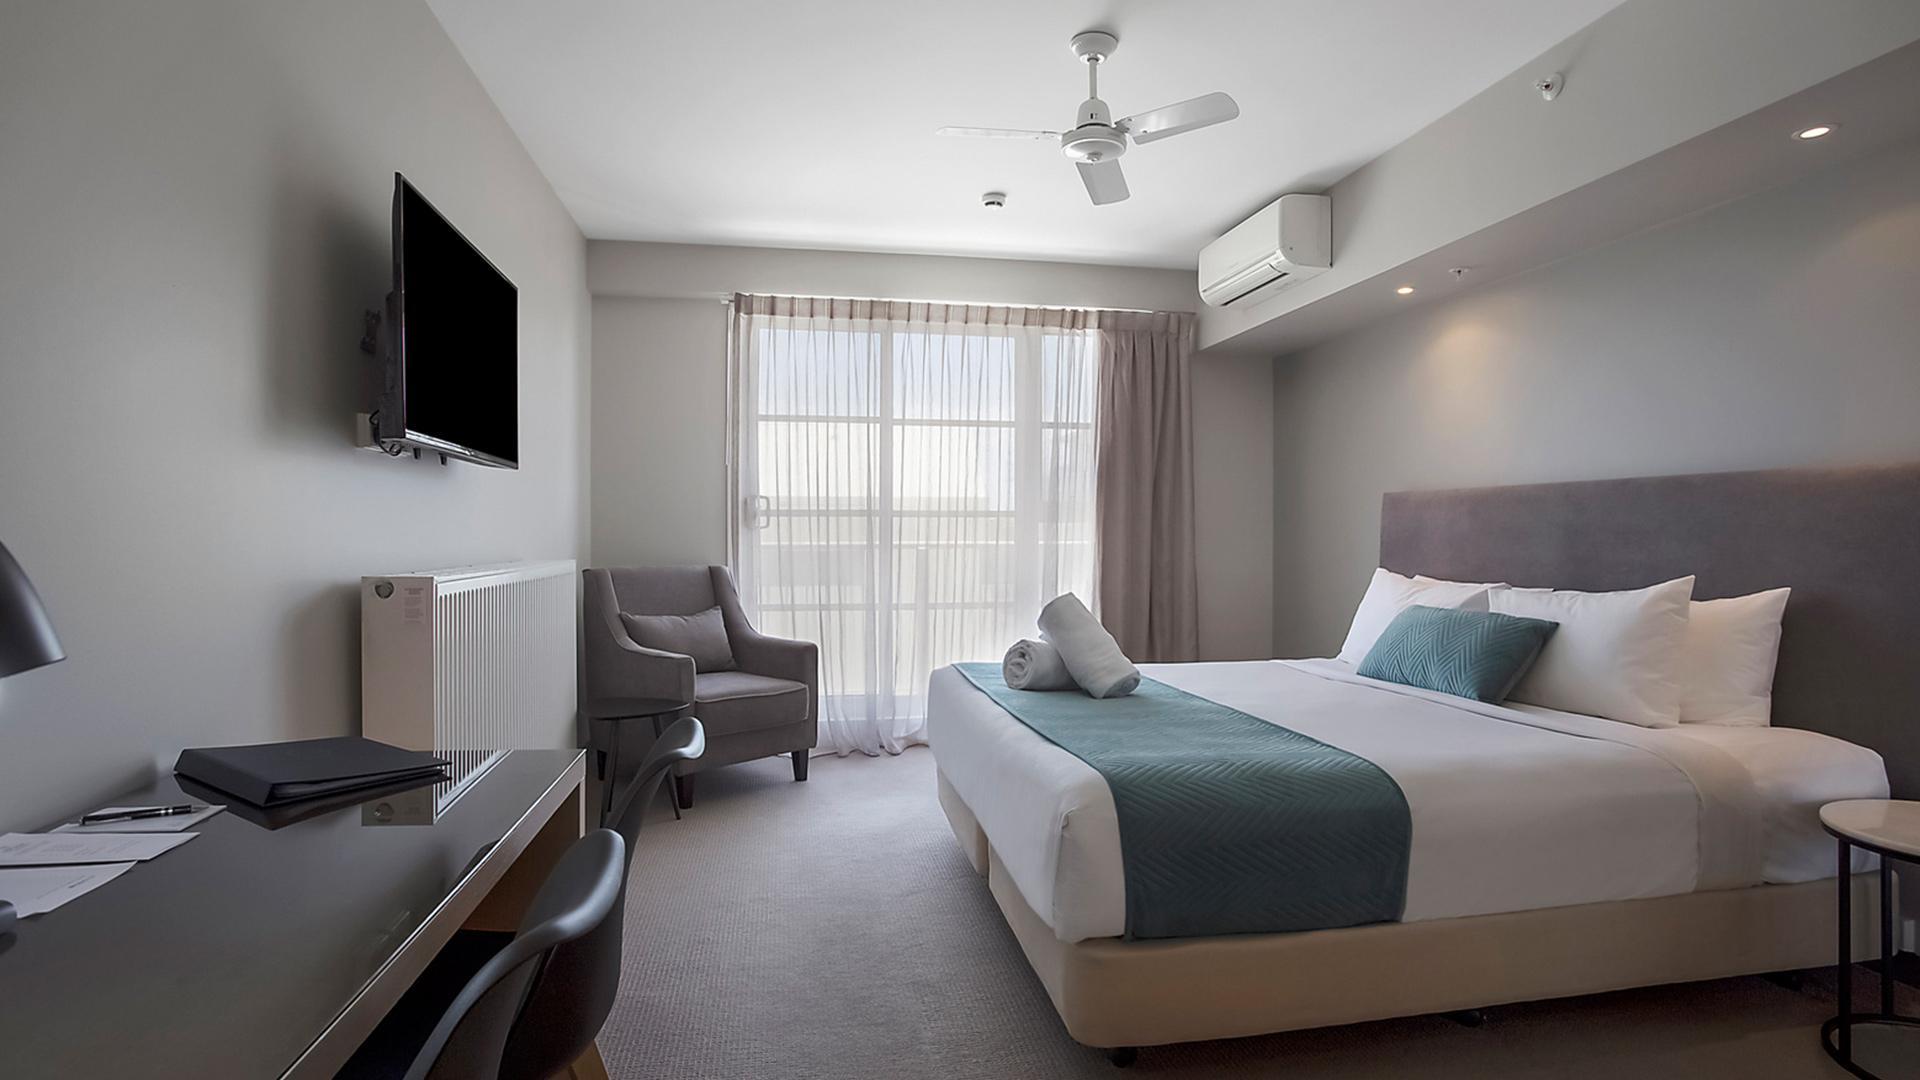 Premium Studio King image 1 at Deep Blue Hotel & Hot Springs by Warrnambool City, Victoria, Australia